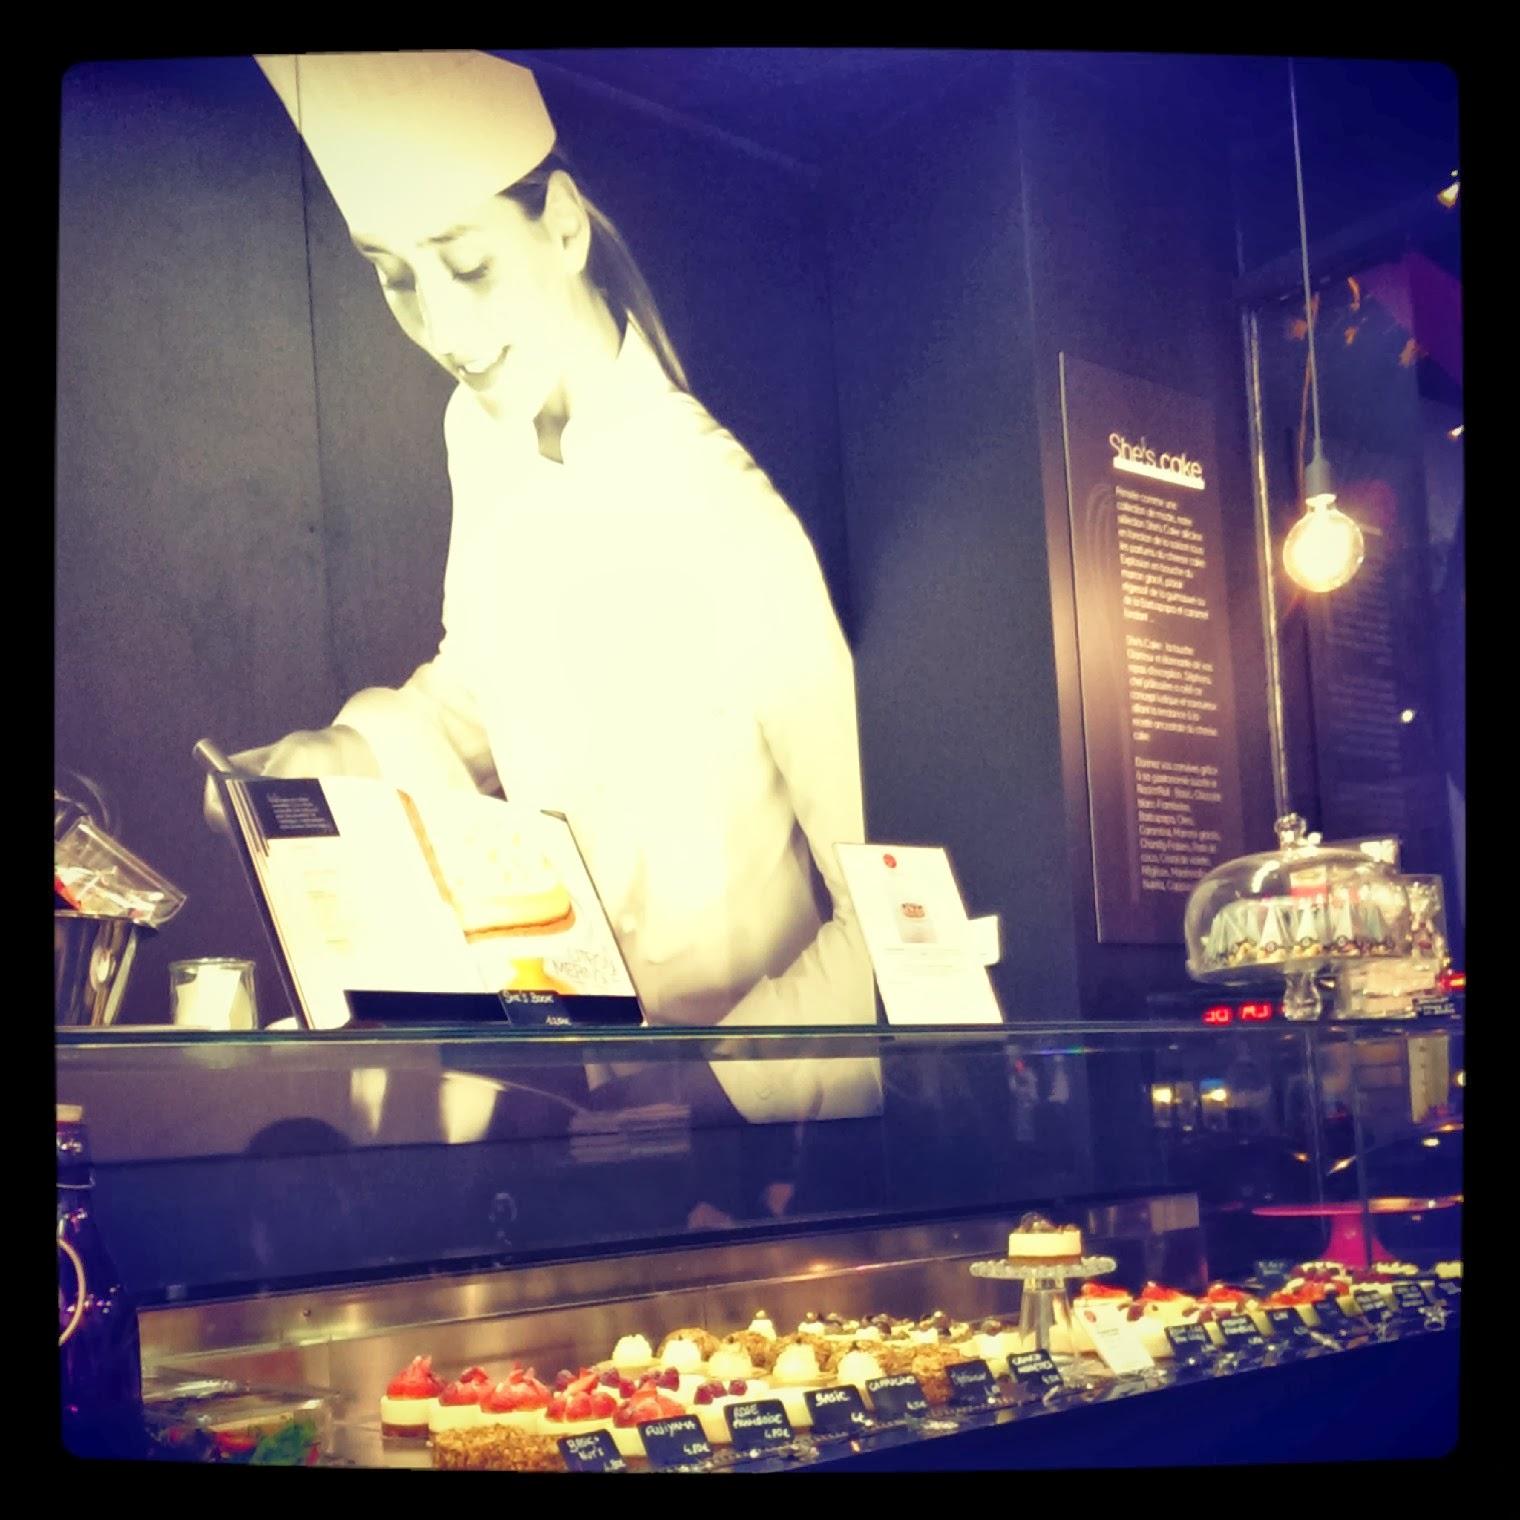 la dinette de nelly: #noelcanderel chez she's cake { sephora saada